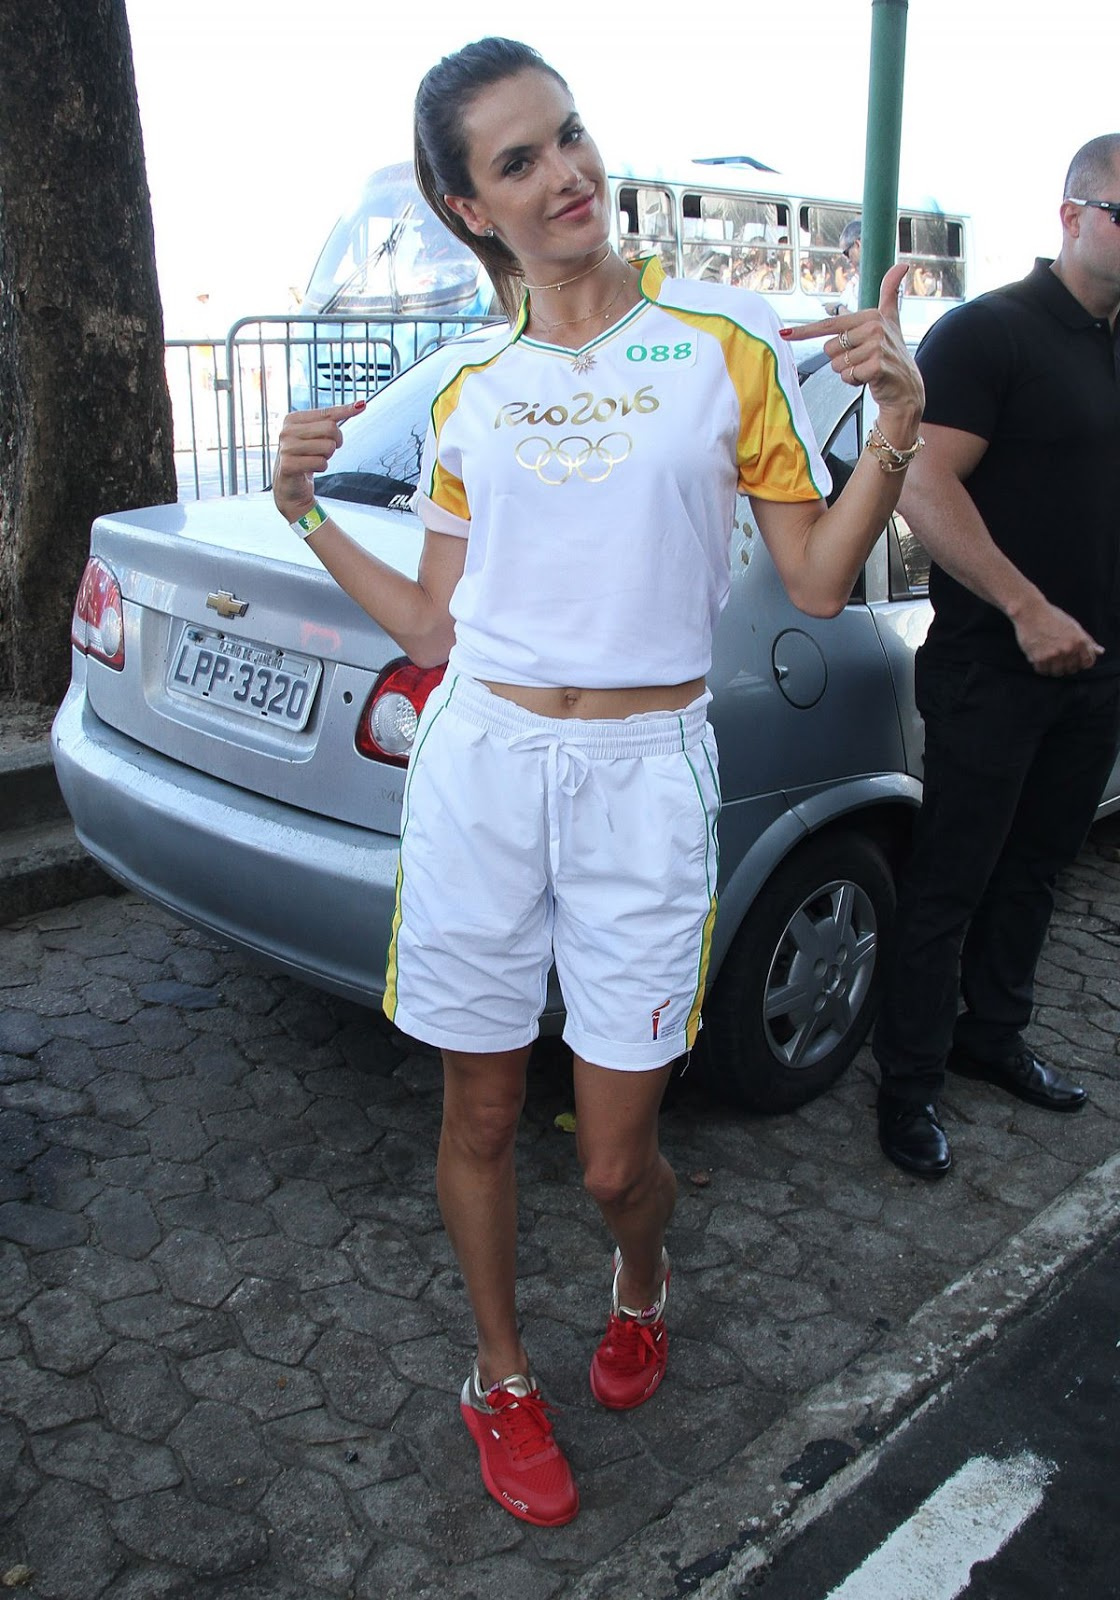 Alessandra Ambrosio Runs with Olympic Flame Through Rio De Janeiro